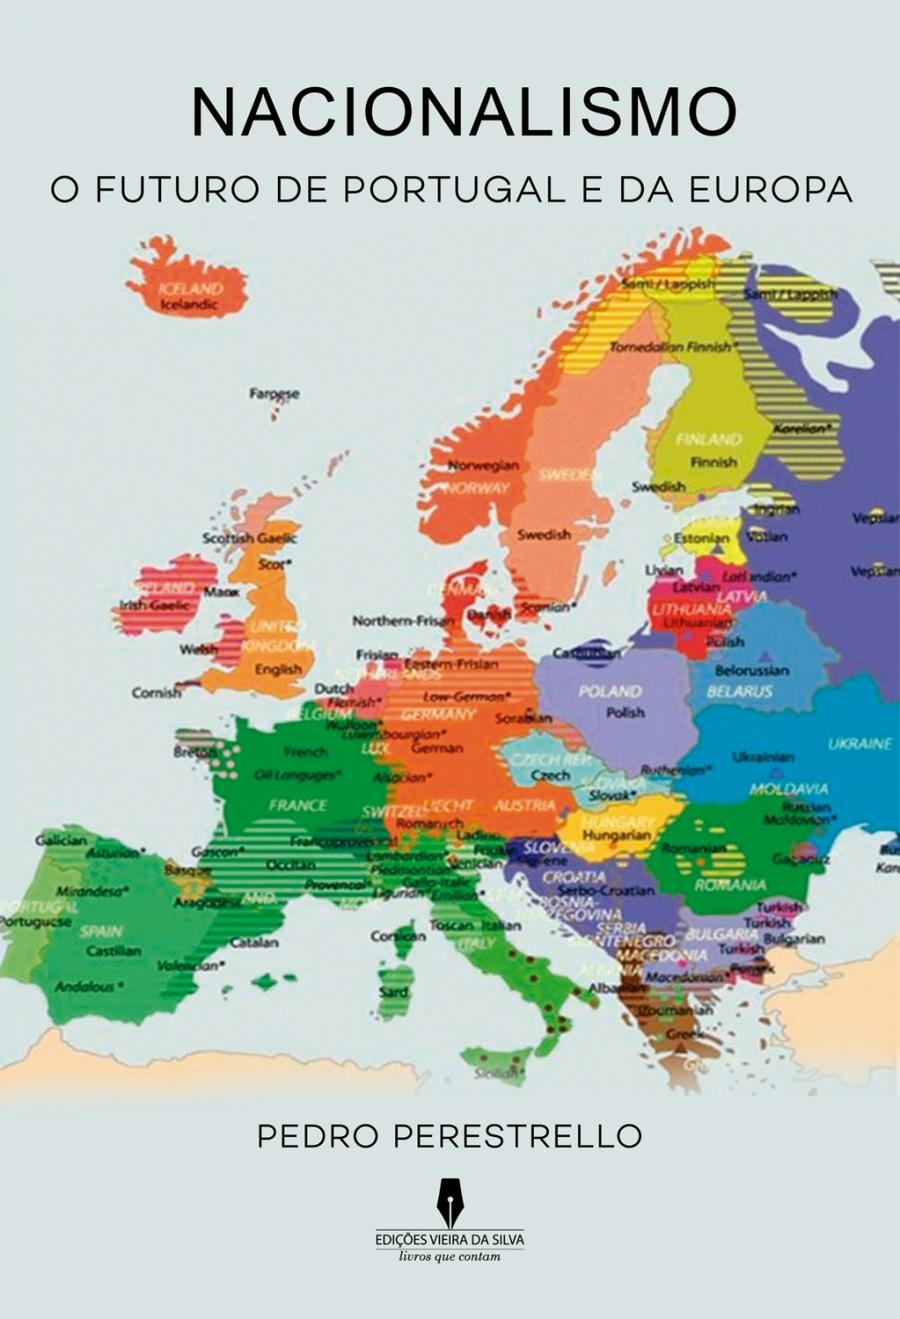 NACIONALISMO o futuro de Portugal e da europa – em debate na FNAC Oeiras